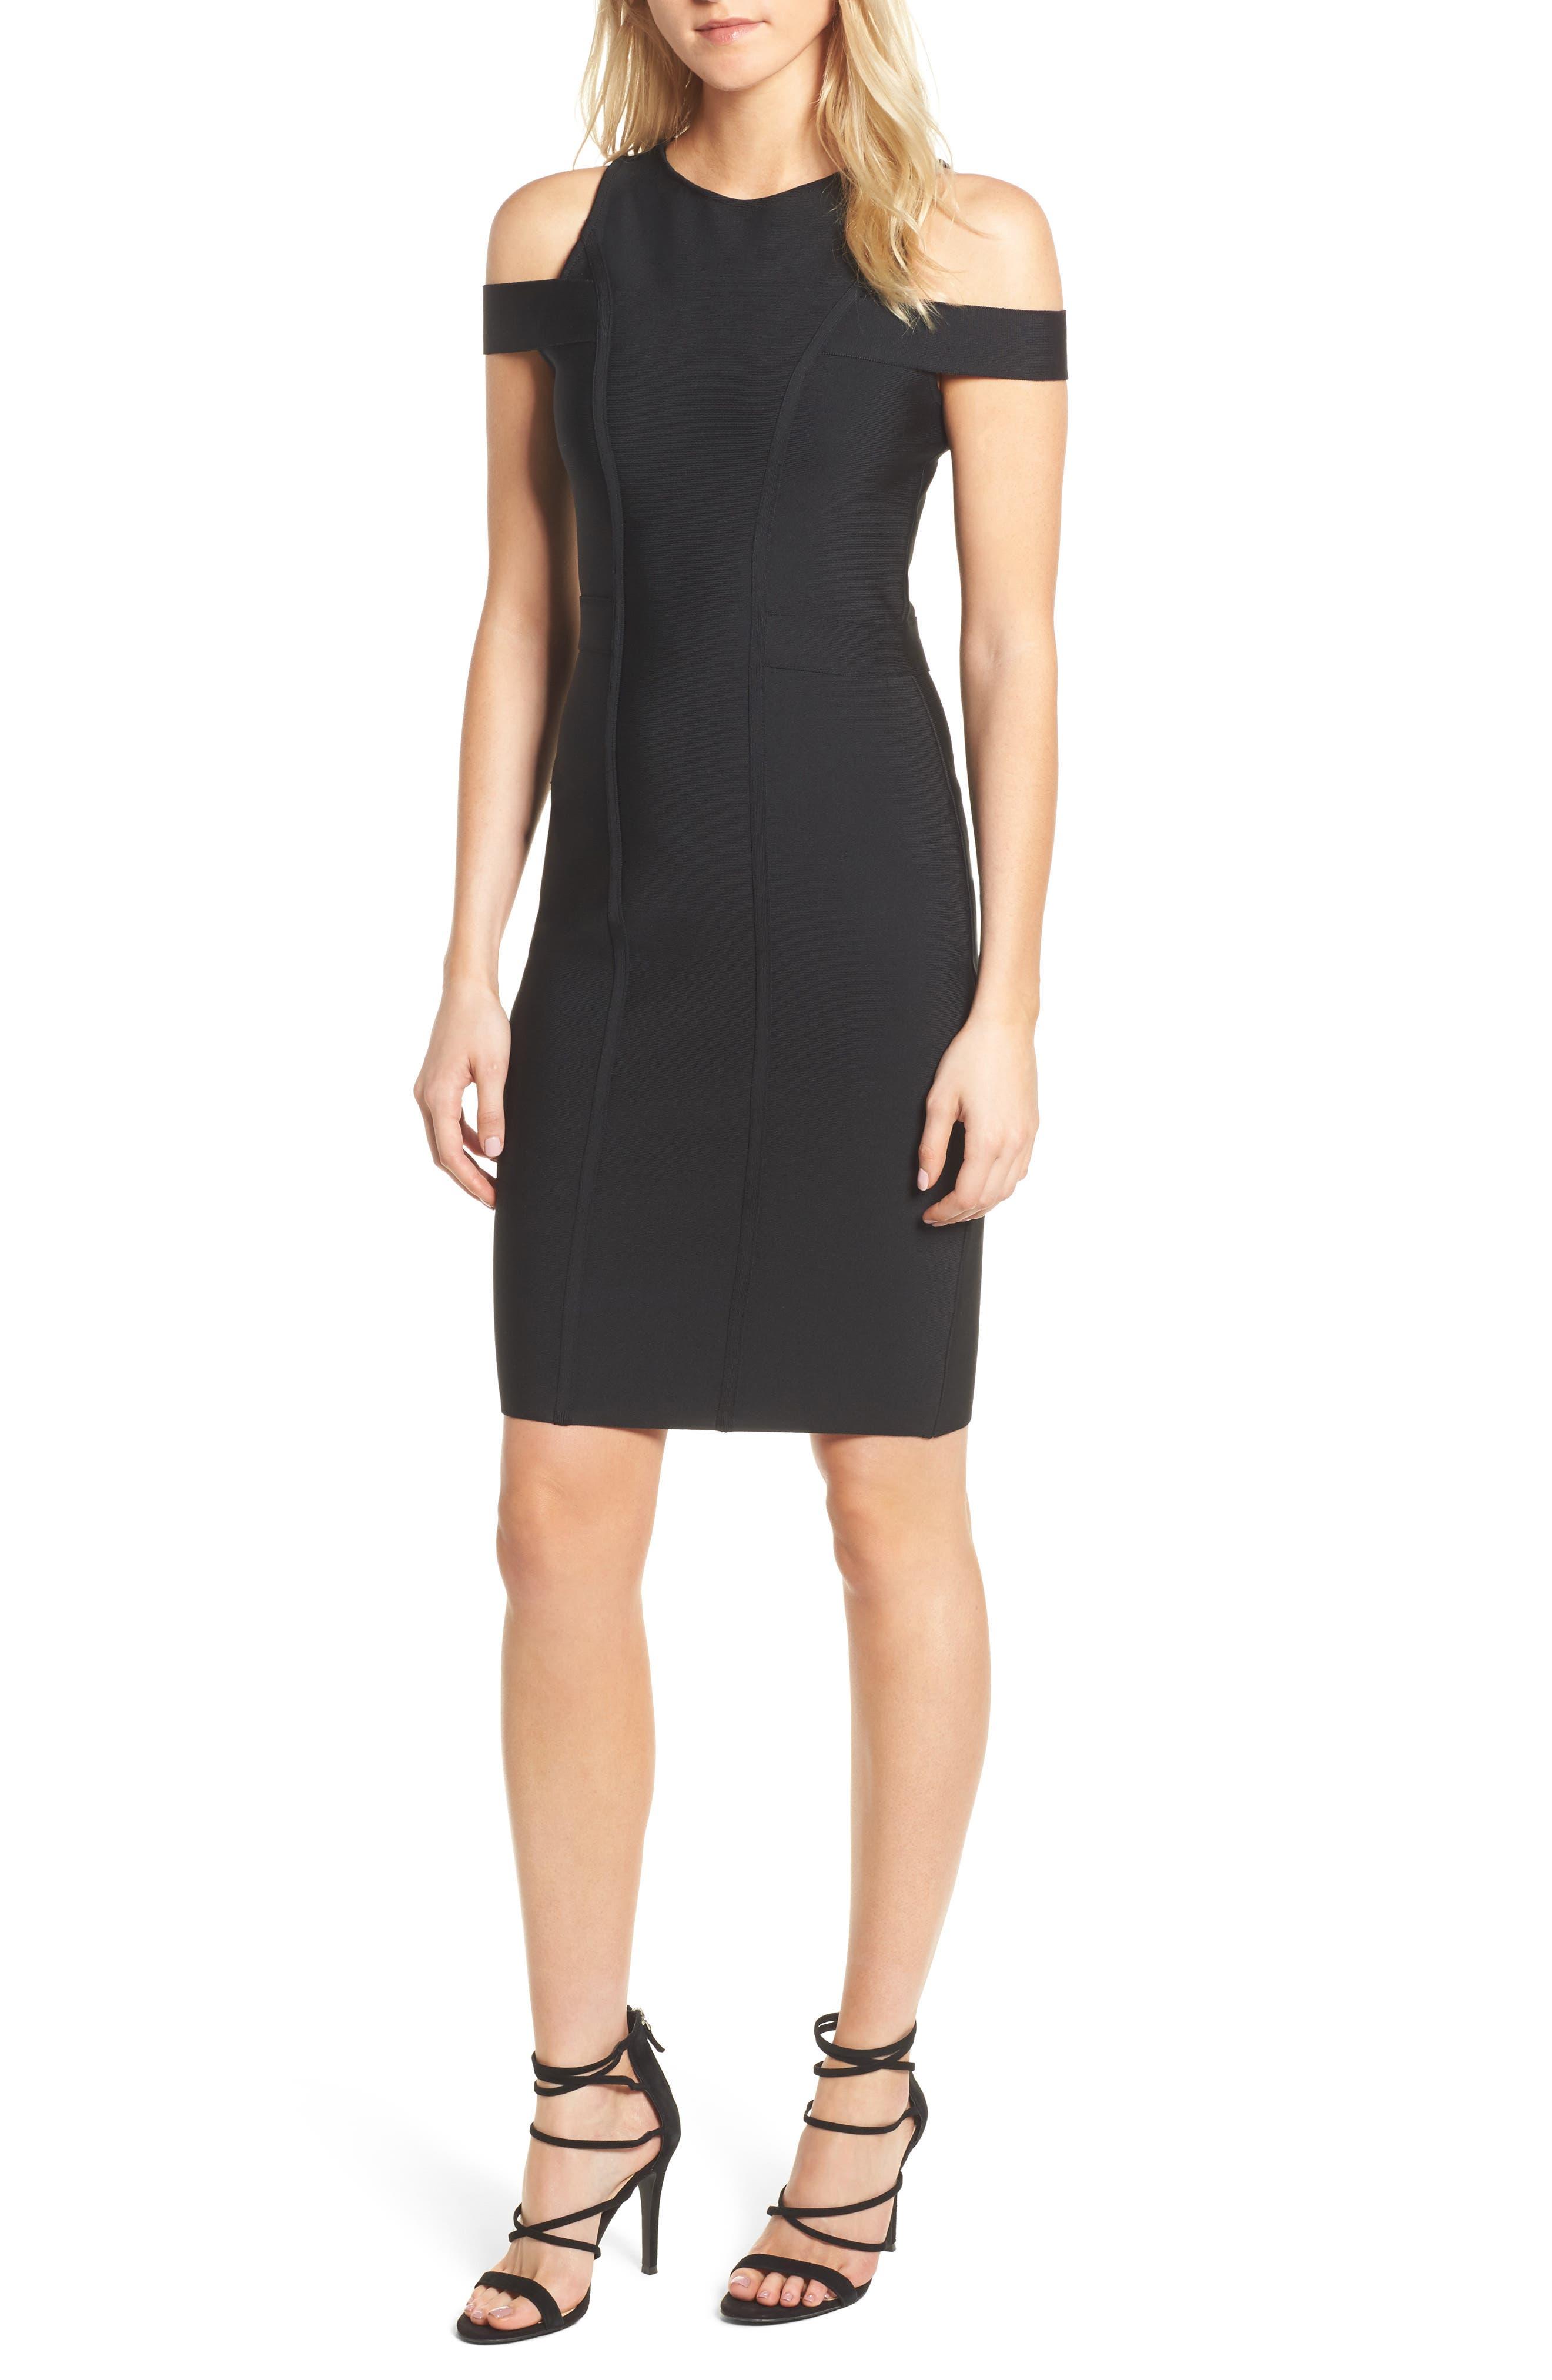 Main Image - Sentimental NY Cold Shoulder Body-Con Dress